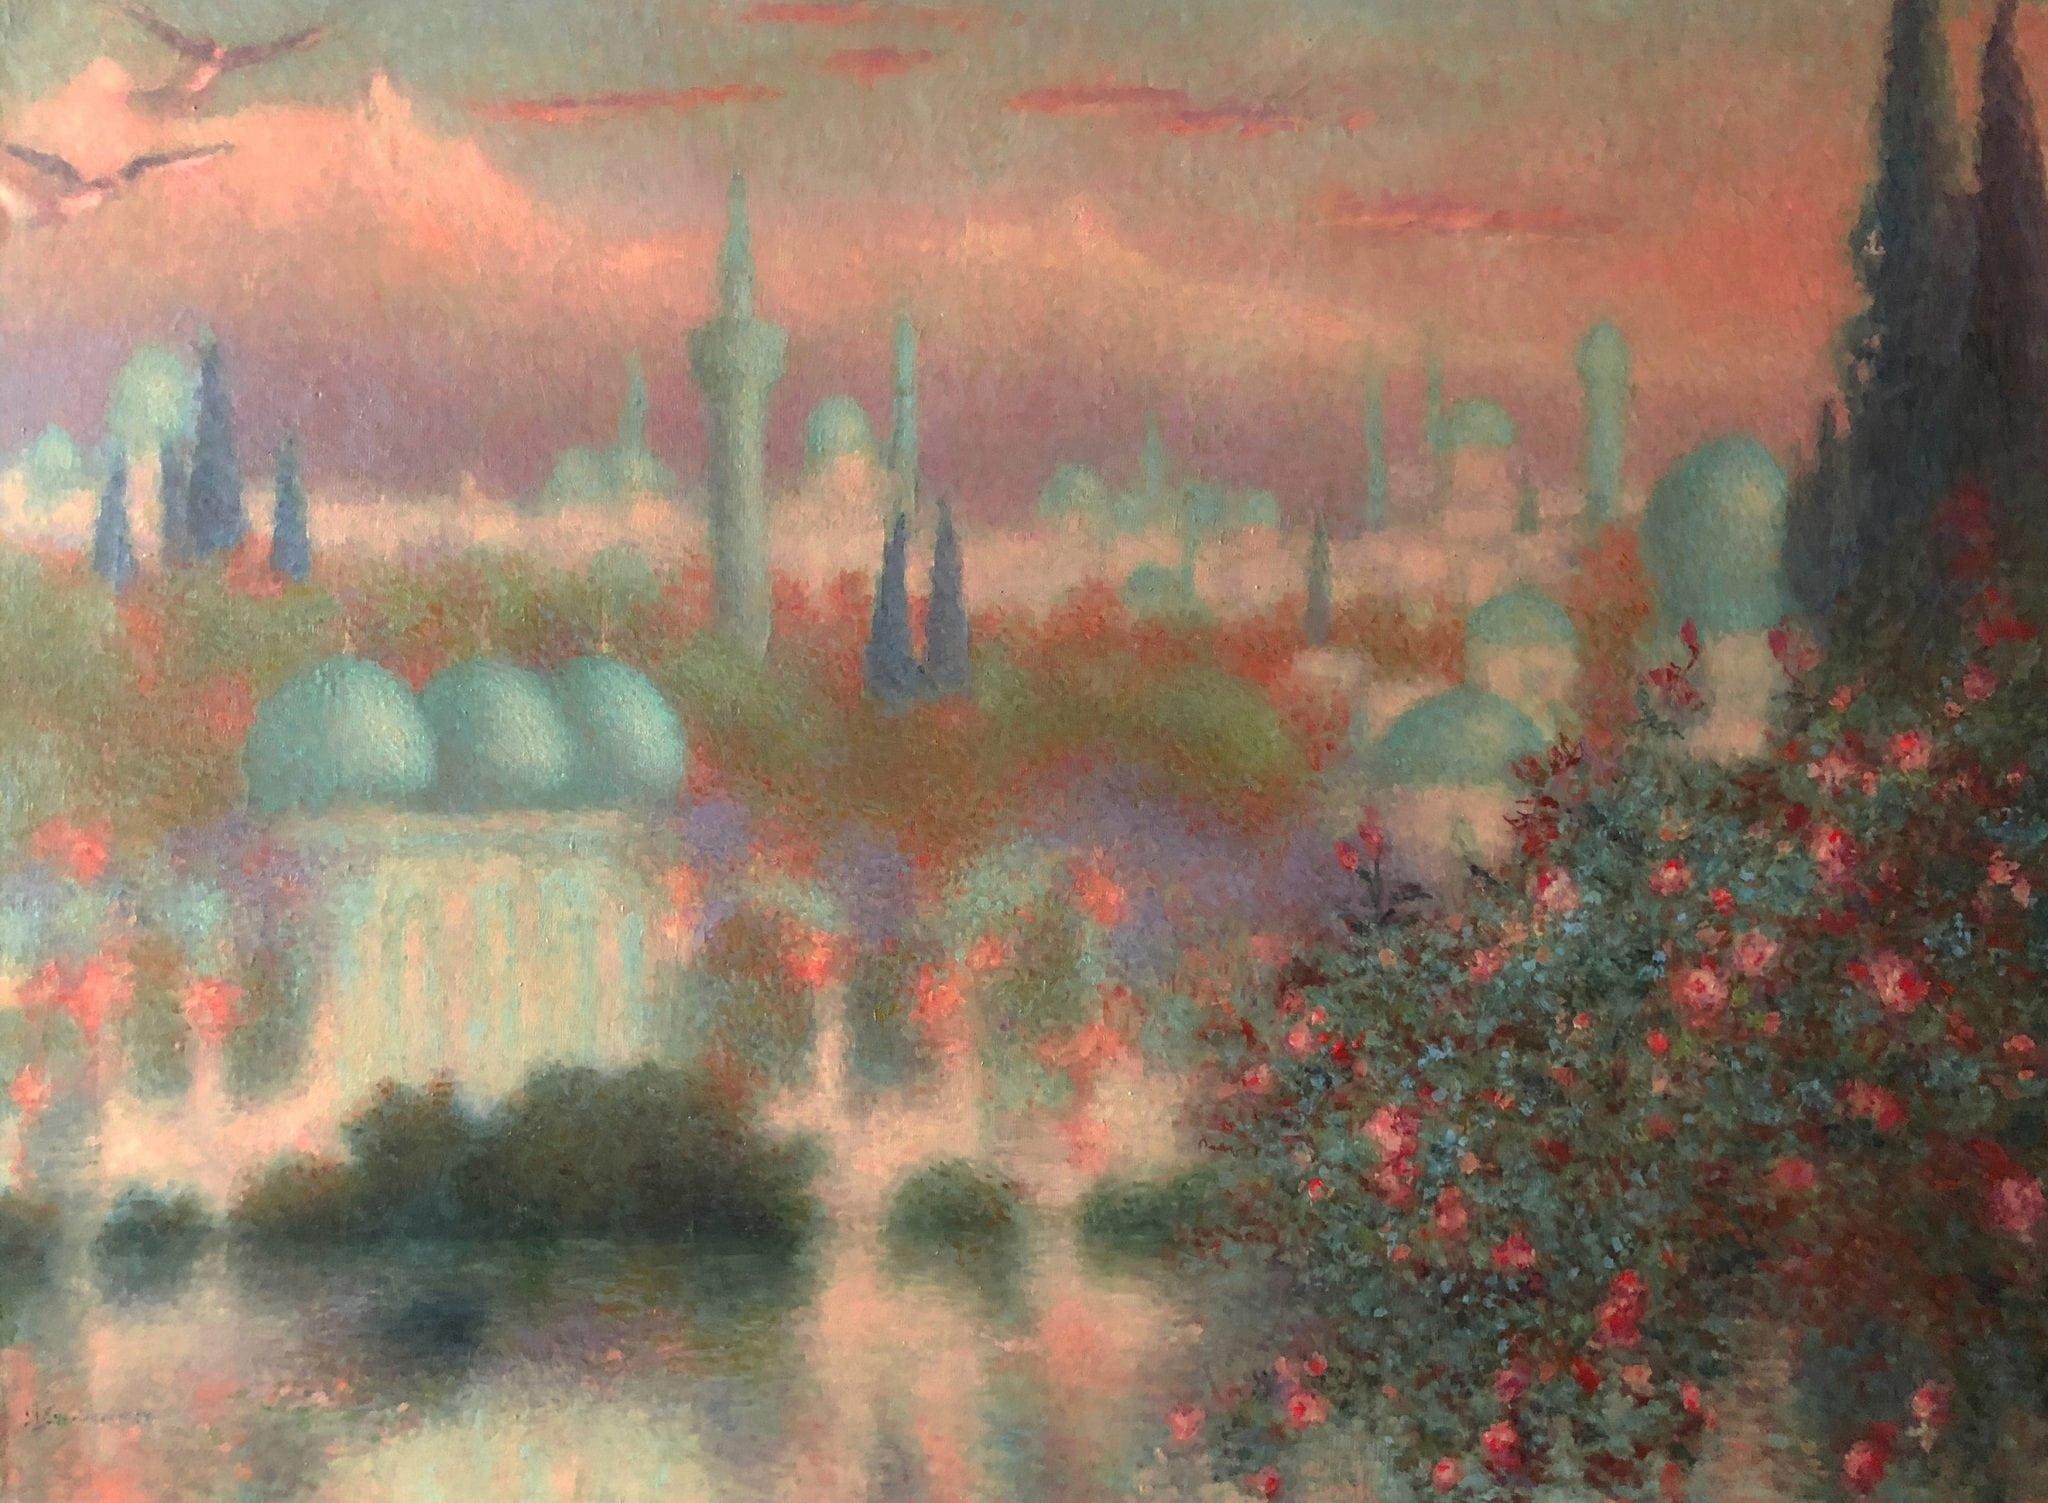 Lévy-Dhurmer, Lucien ~ Les Roses d'Ispahan